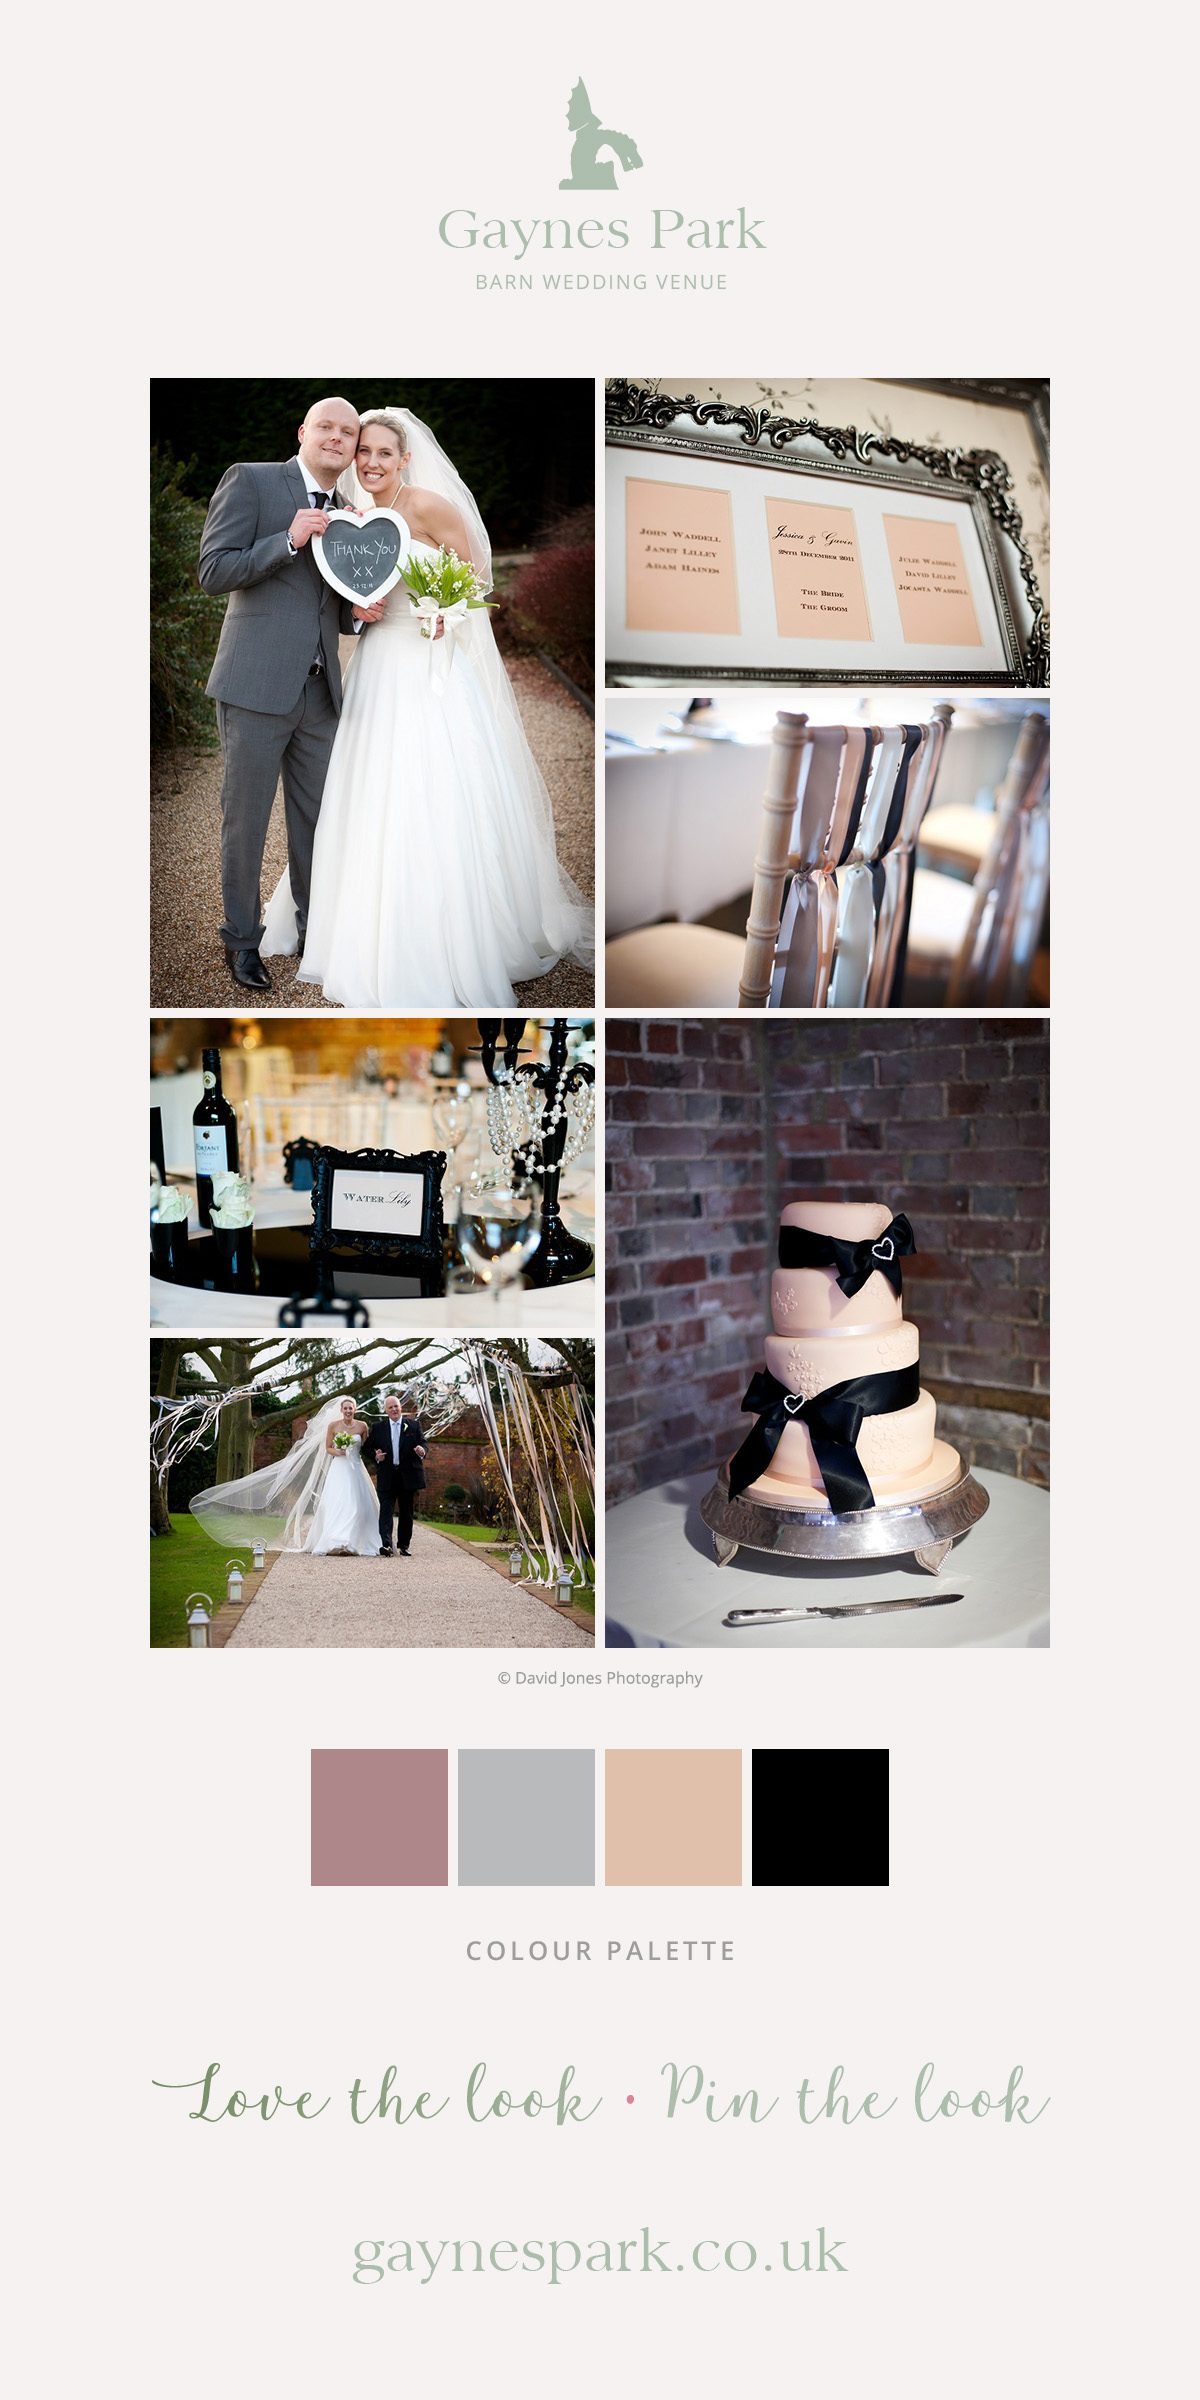 Jessica and Gavin's real life wedding at Gaynes Park